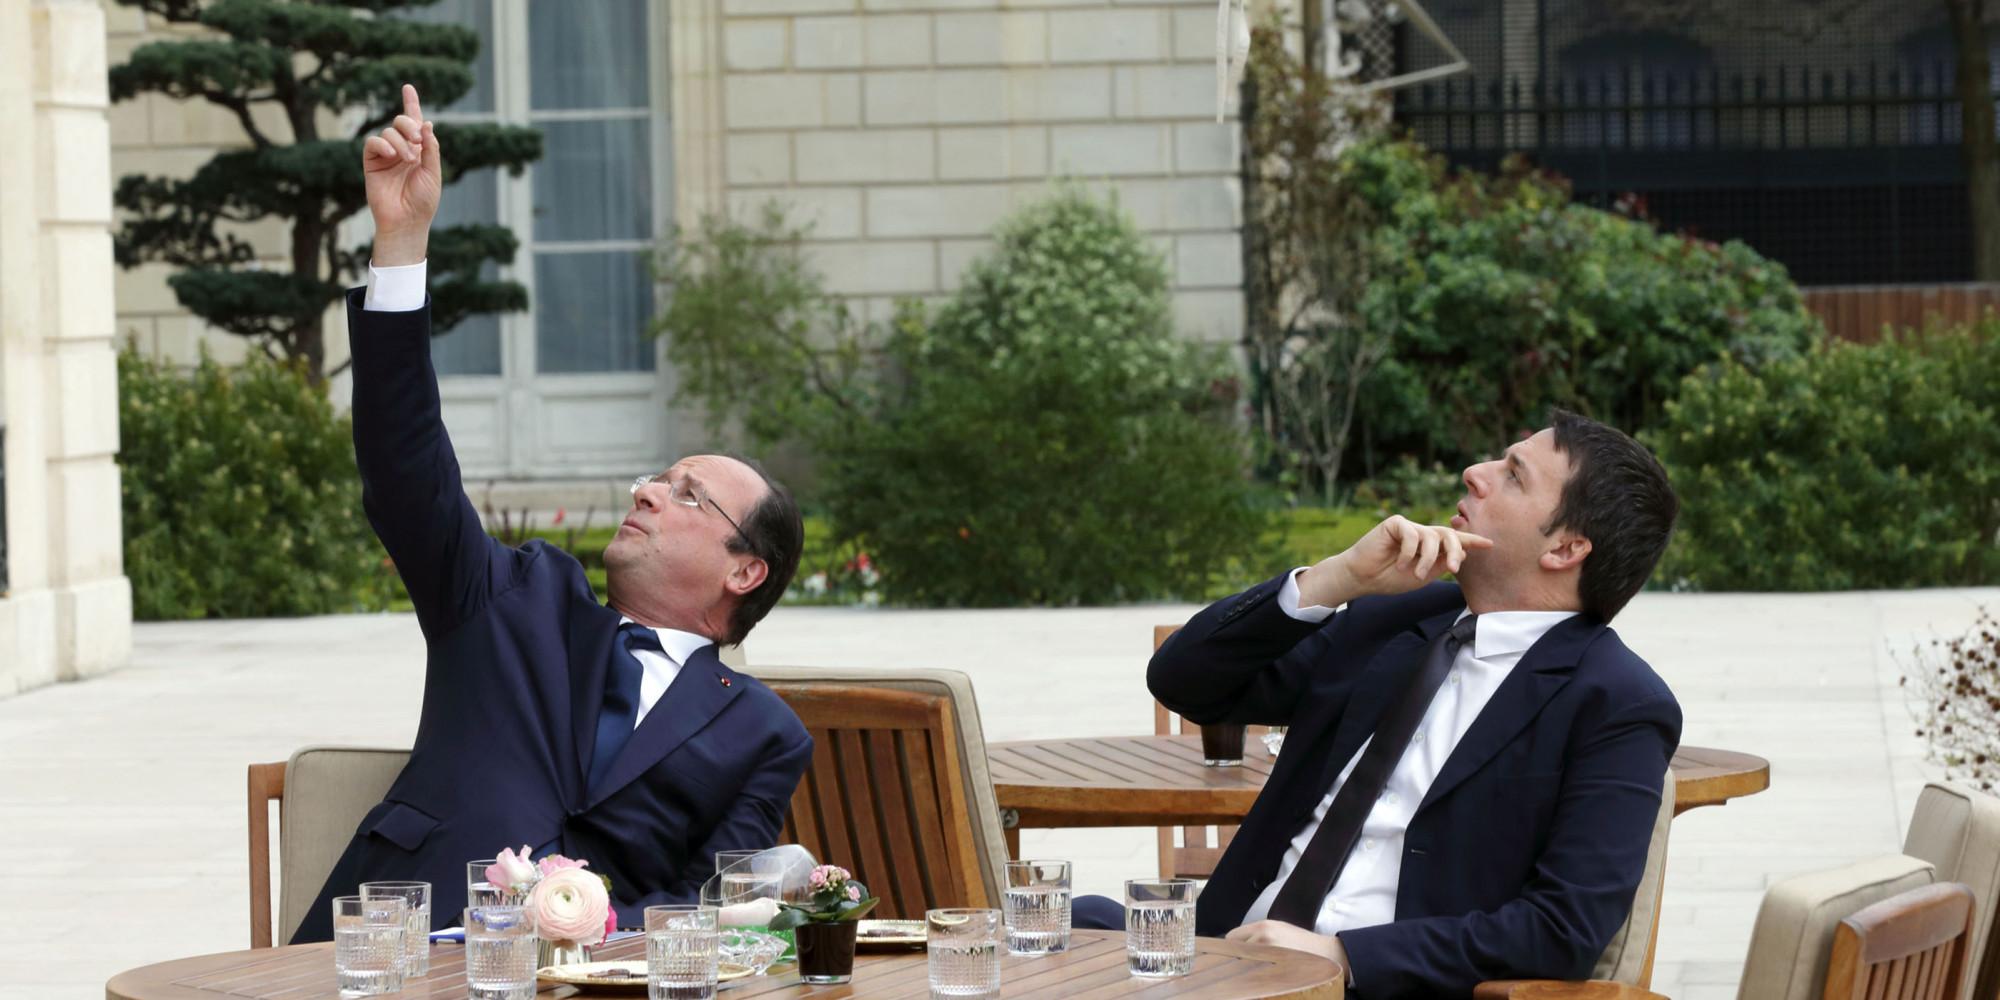 Parigi, Matteo Renzi incontra Francois Hollande